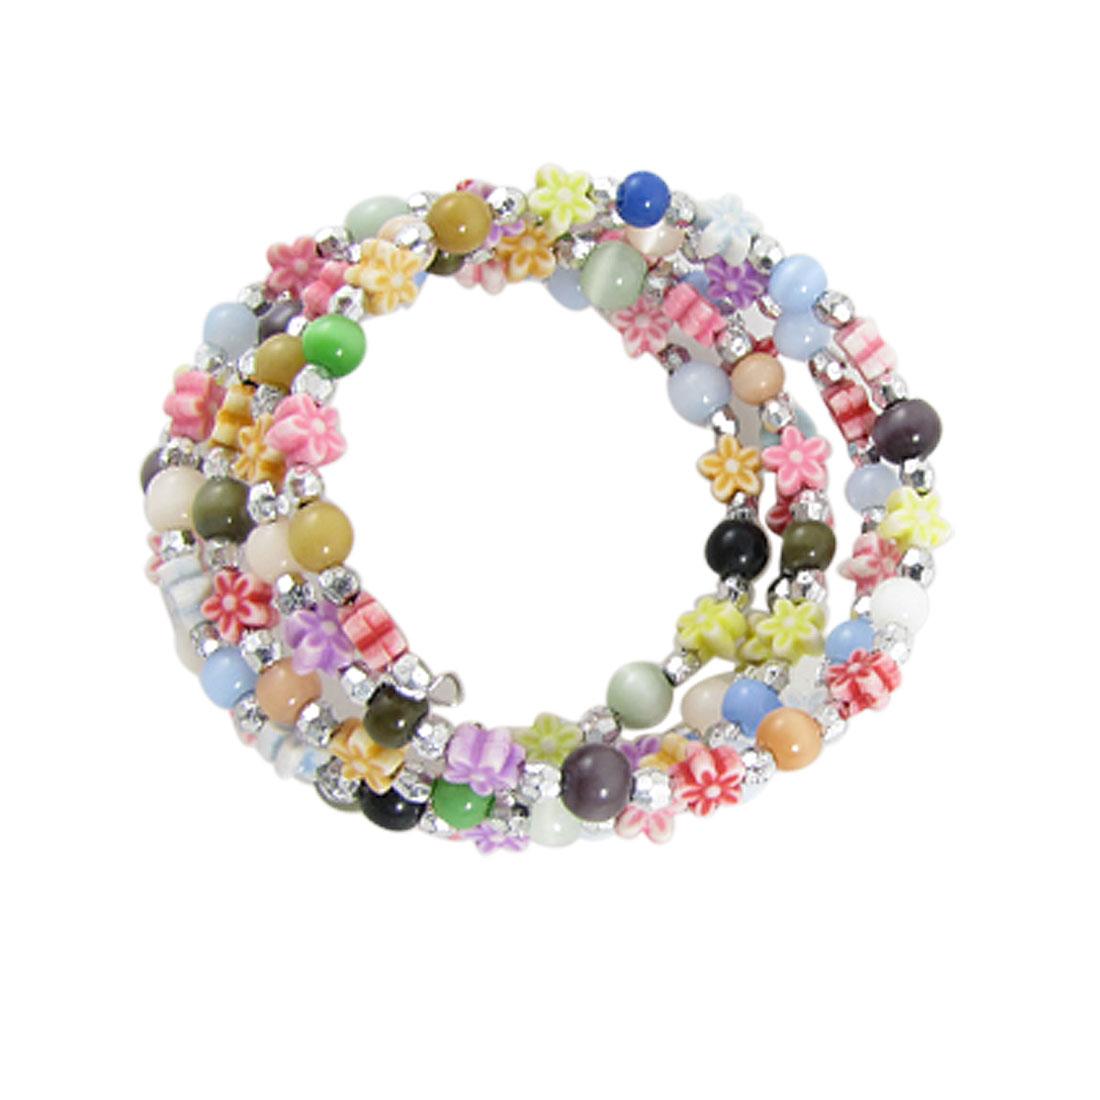 Colorful Beads Flowers Hoop Bangle Bracelet